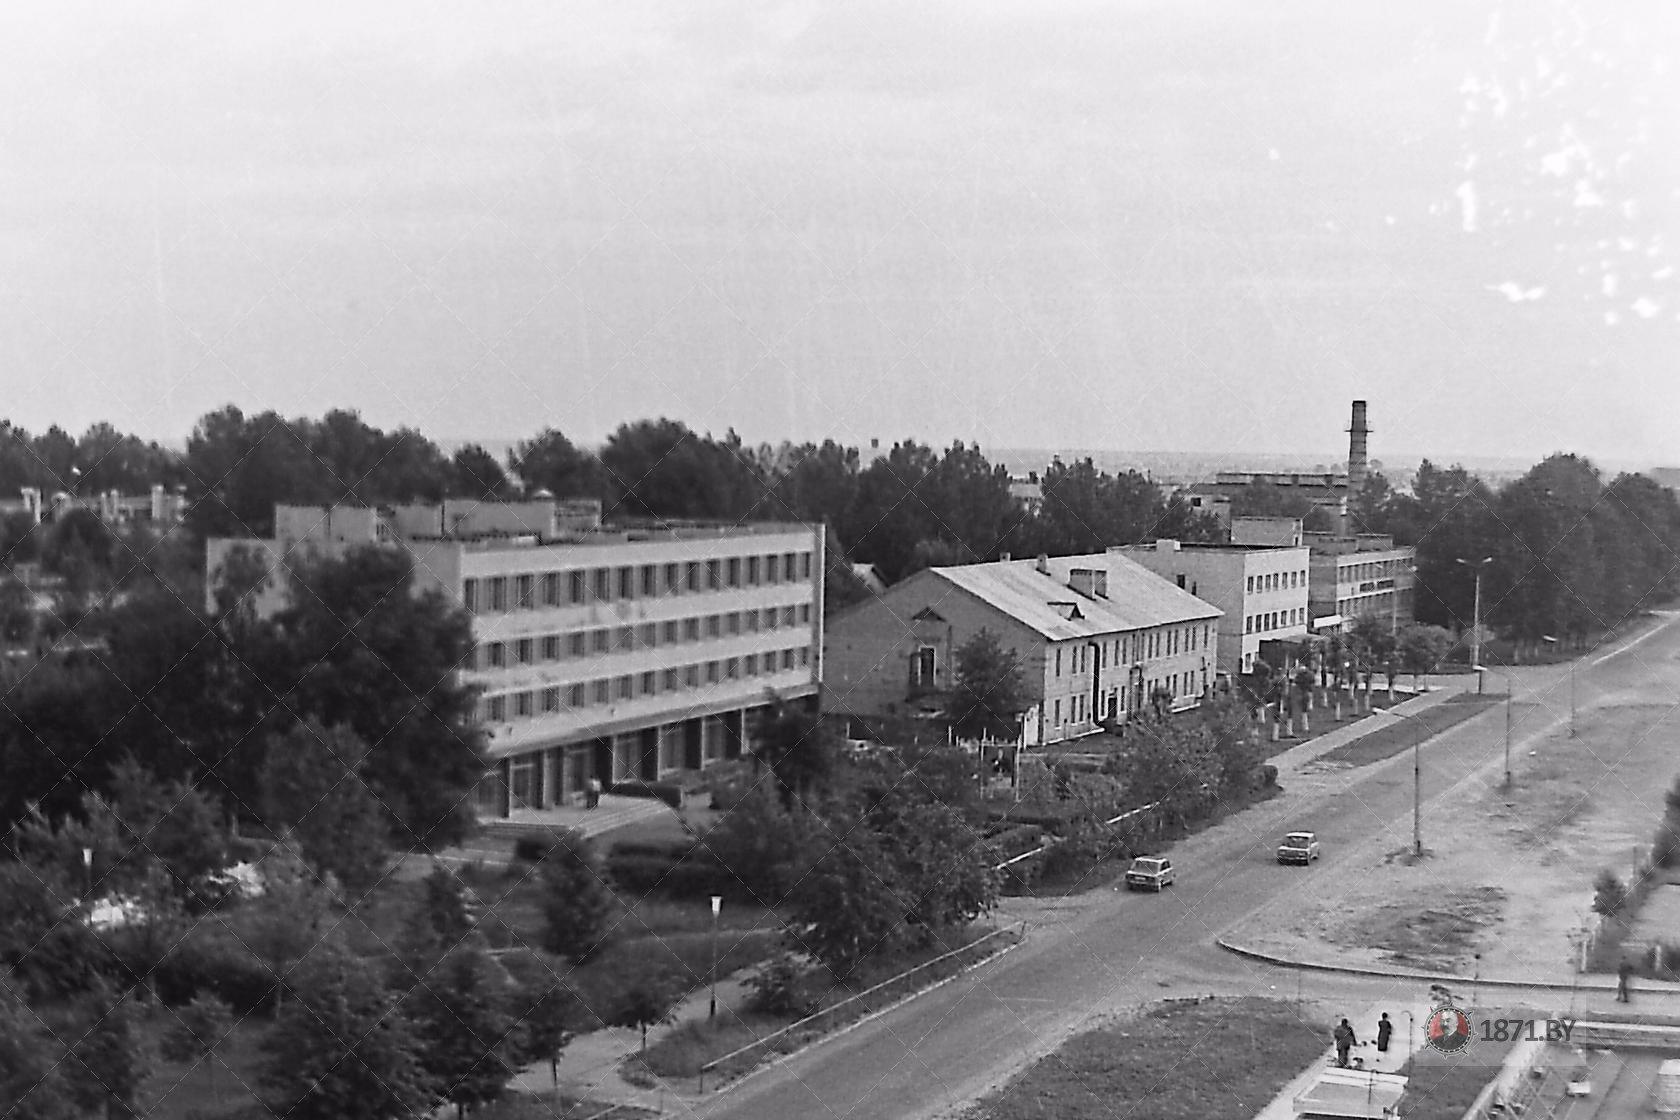 1985 год. Авиаремонтный завод. Фото: сайт 1871.by